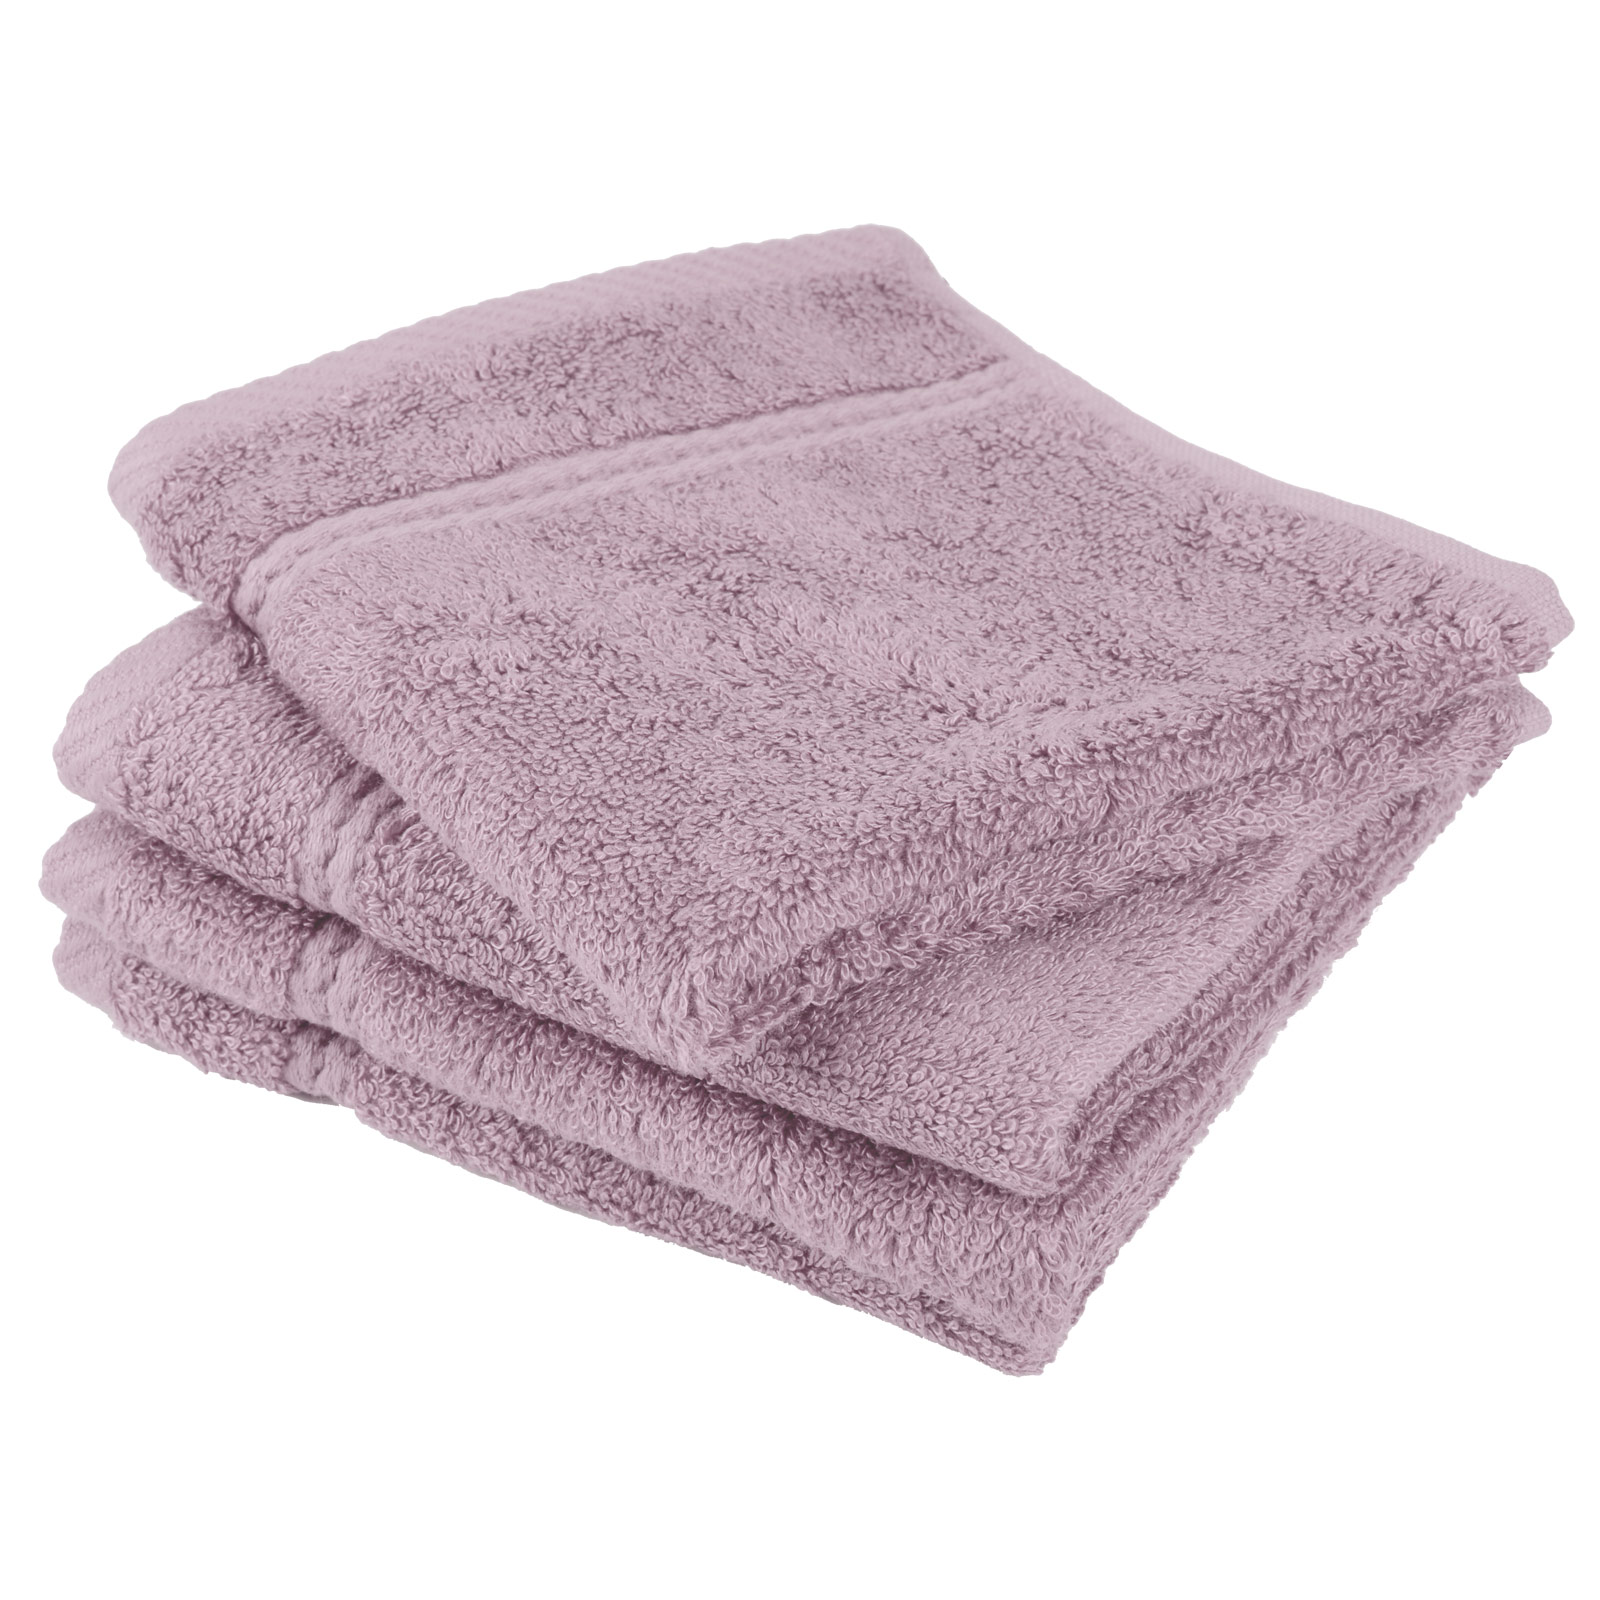 bathroom linen bath sheet bath towel hand towels face cloth 22 colours ebay. Black Bedroom Furniture Sets. Home Design Ideas